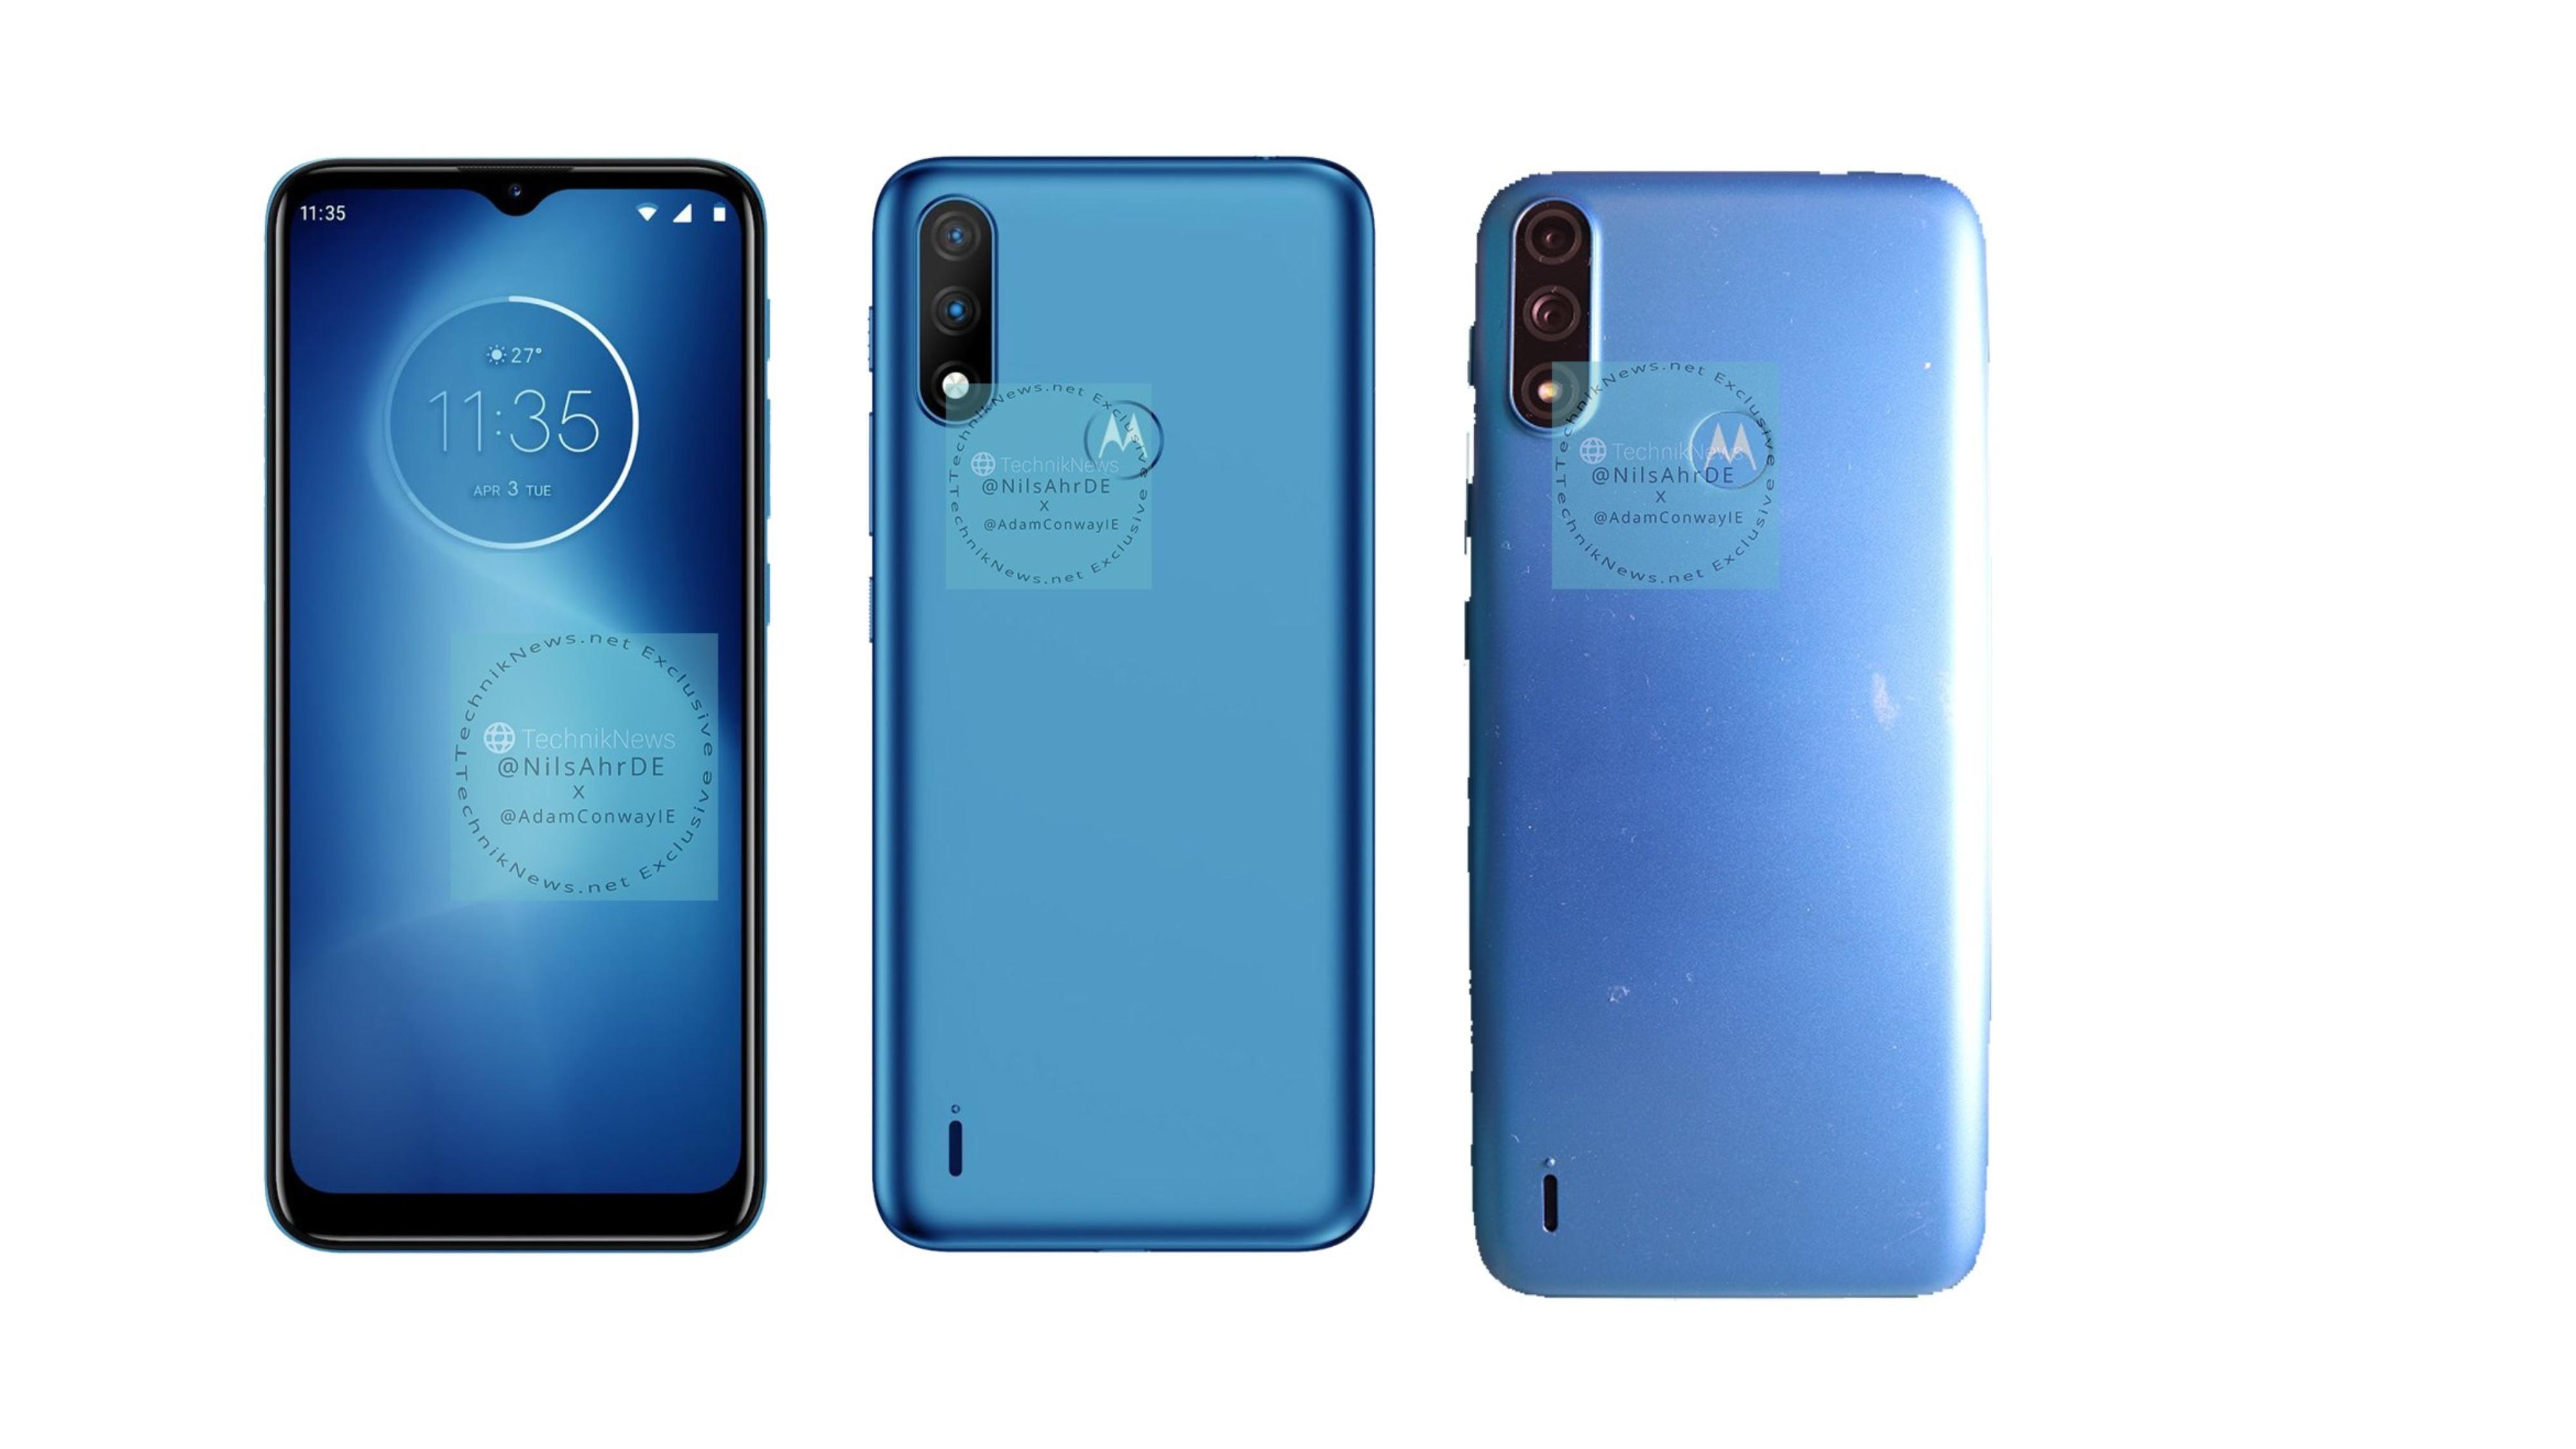 Motorola Moto E7 Power Renders Live Images Leak